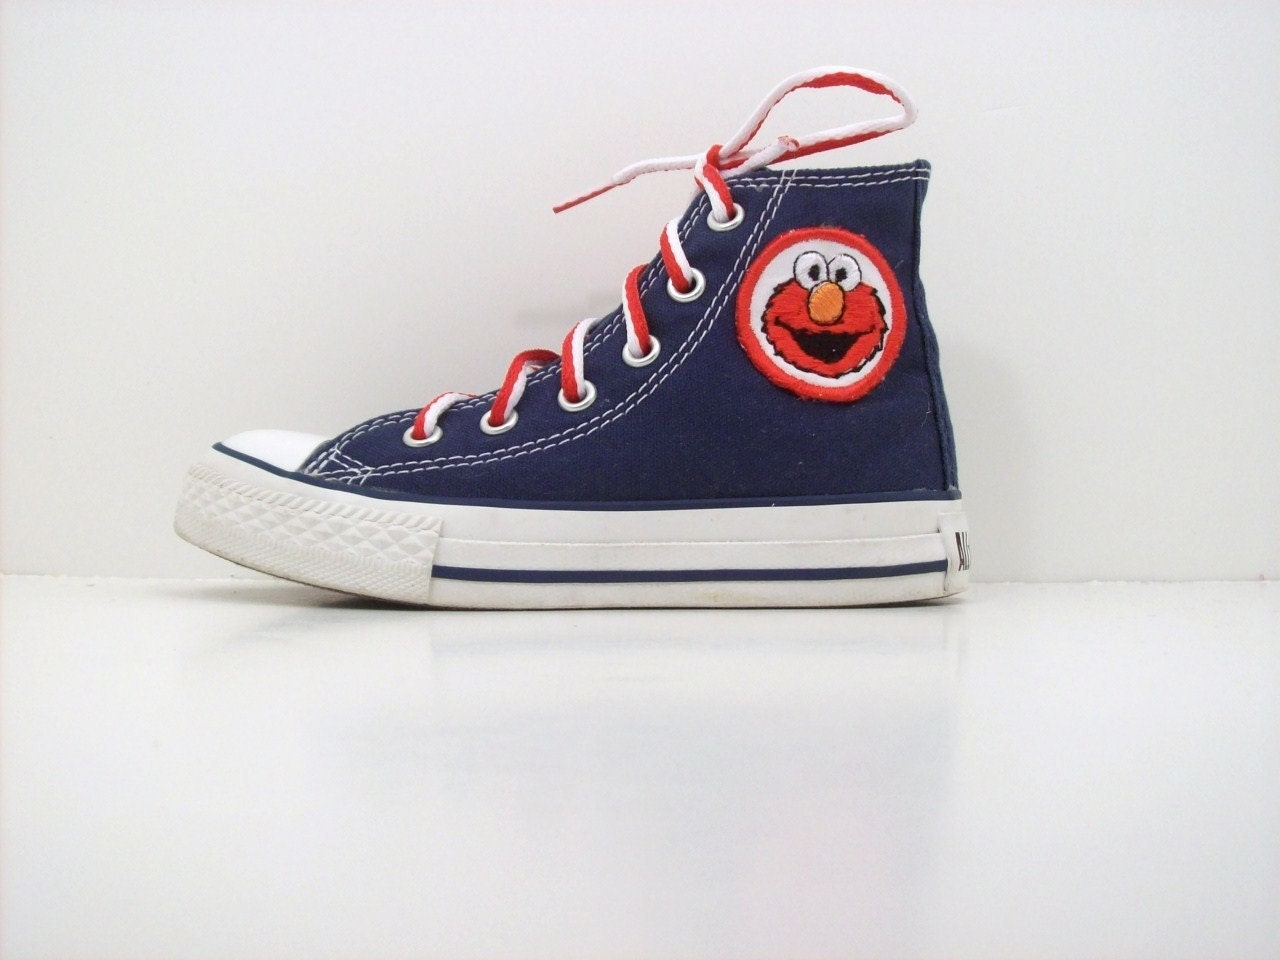 Elmo Converse Shoes